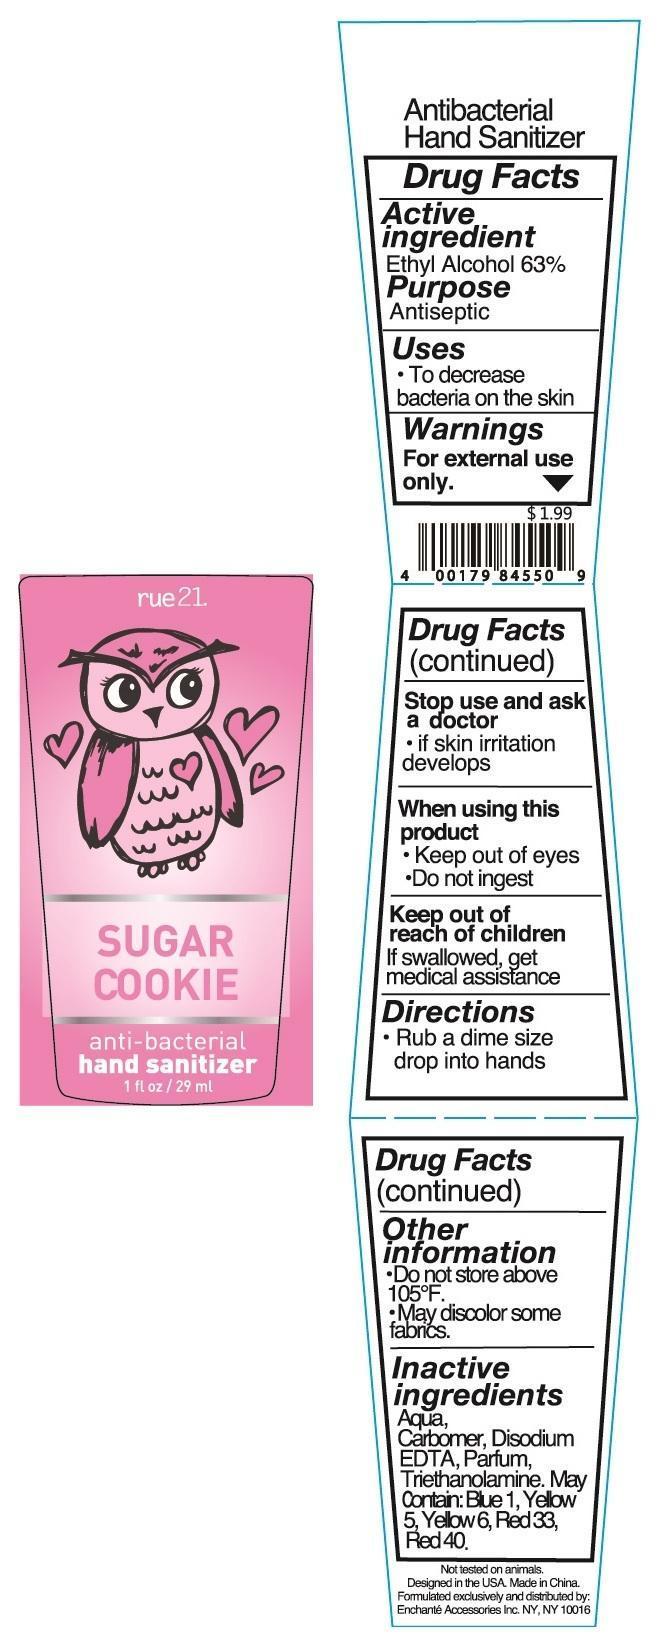 Rue 21 Sugar Cookie Anti Bacterial Hand Sanitizer (Alcohol) Liquid [Enchante Accessories Inc. ]